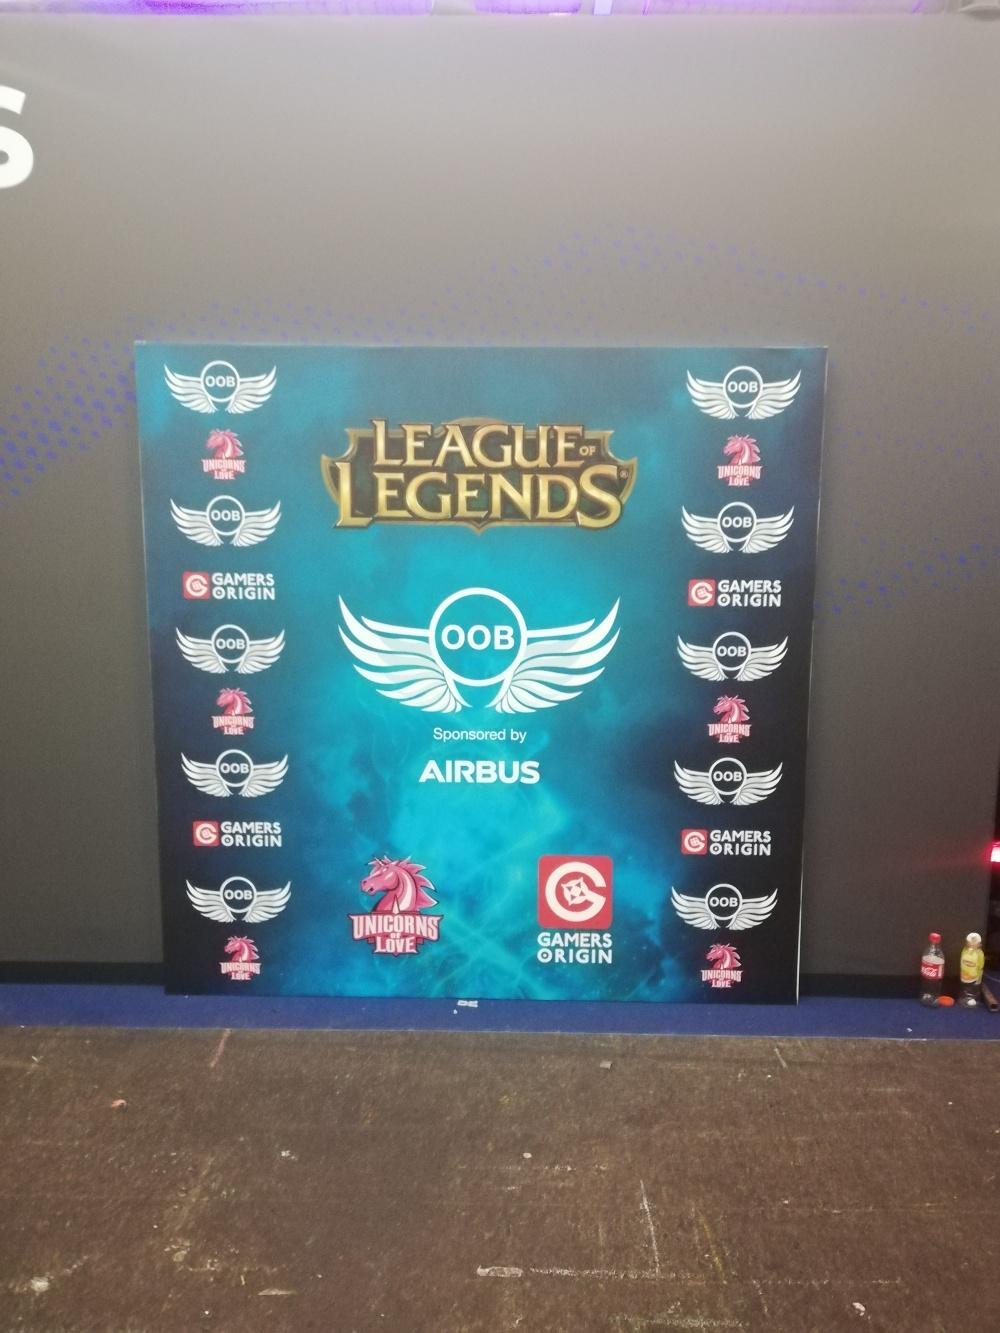 League of Legends (Airbus)